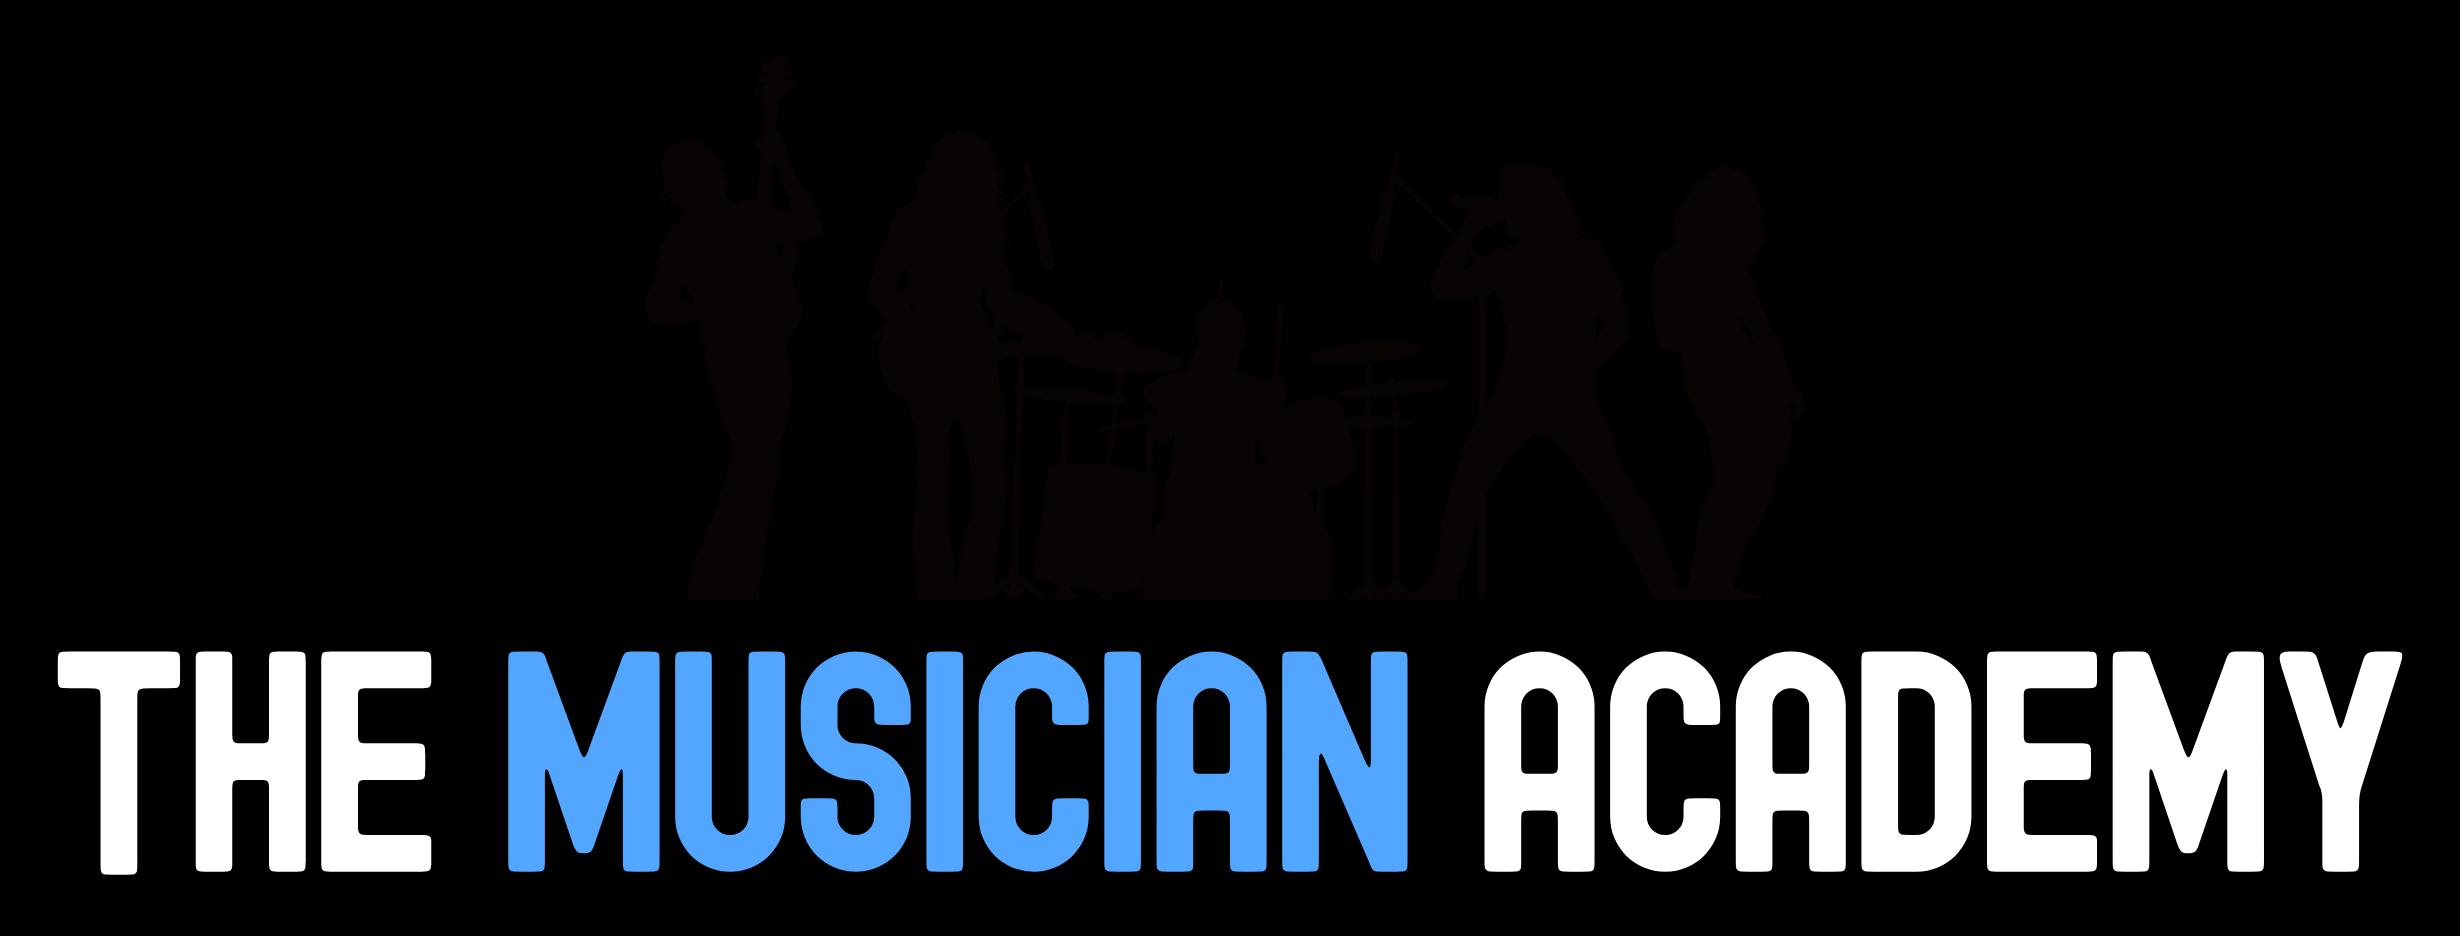 The Musician Academy Banner